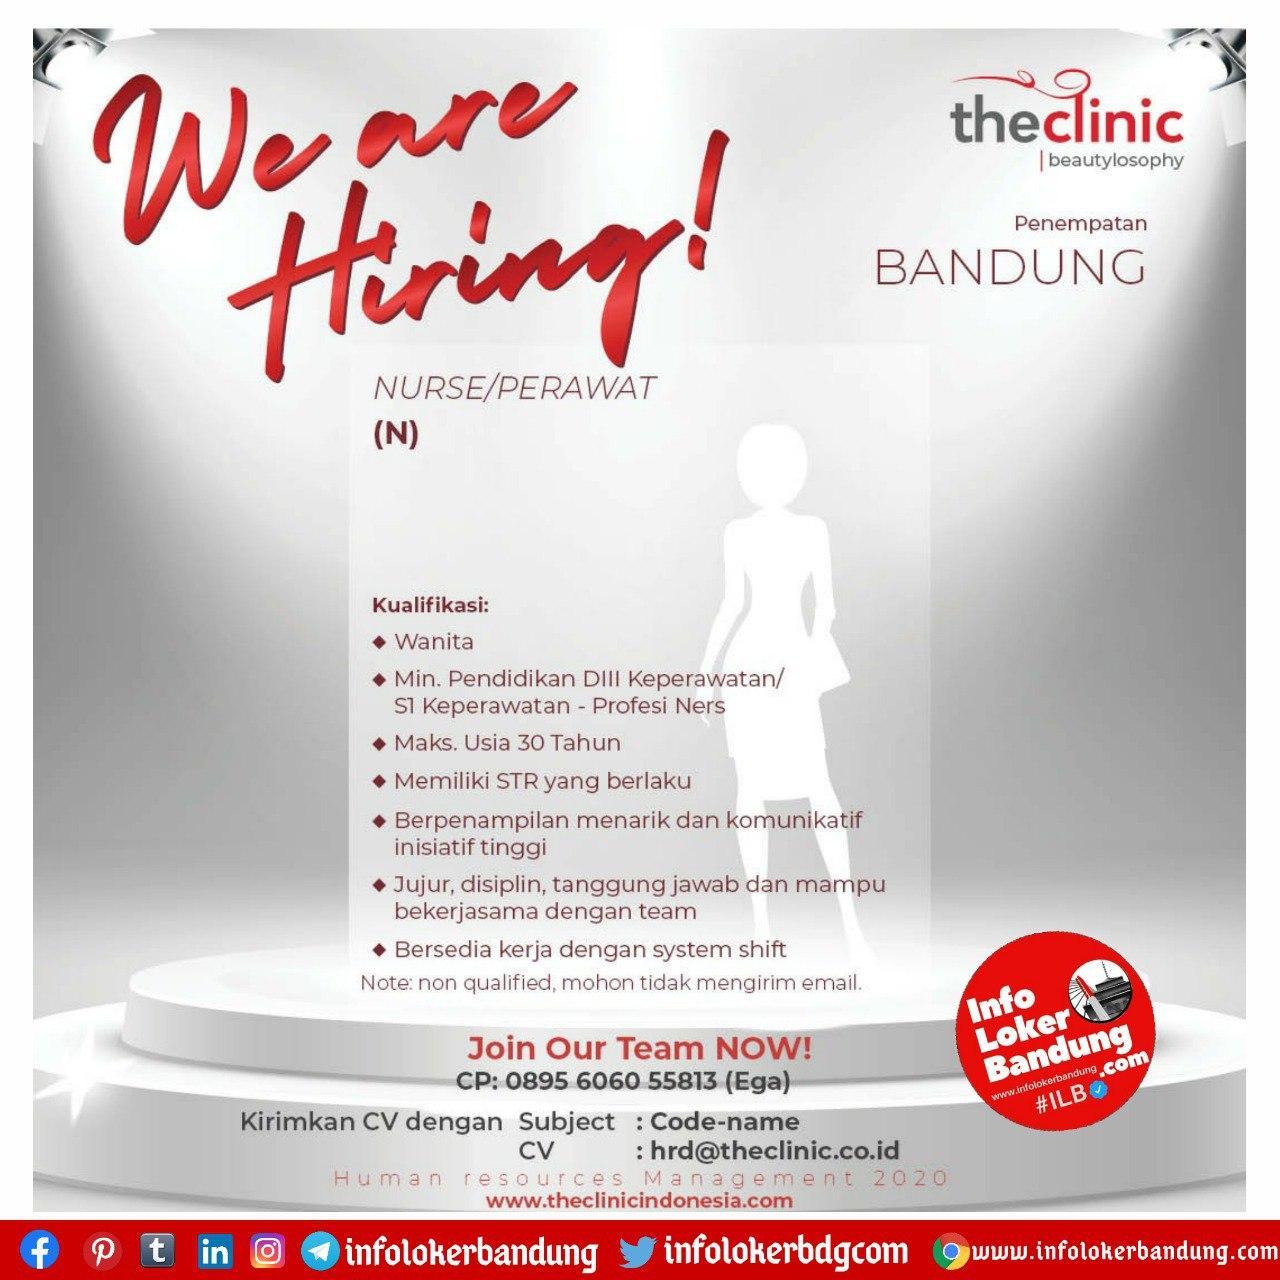 Lowongan Kerja Nurse / Perawat Theclinic Bandung September 2020